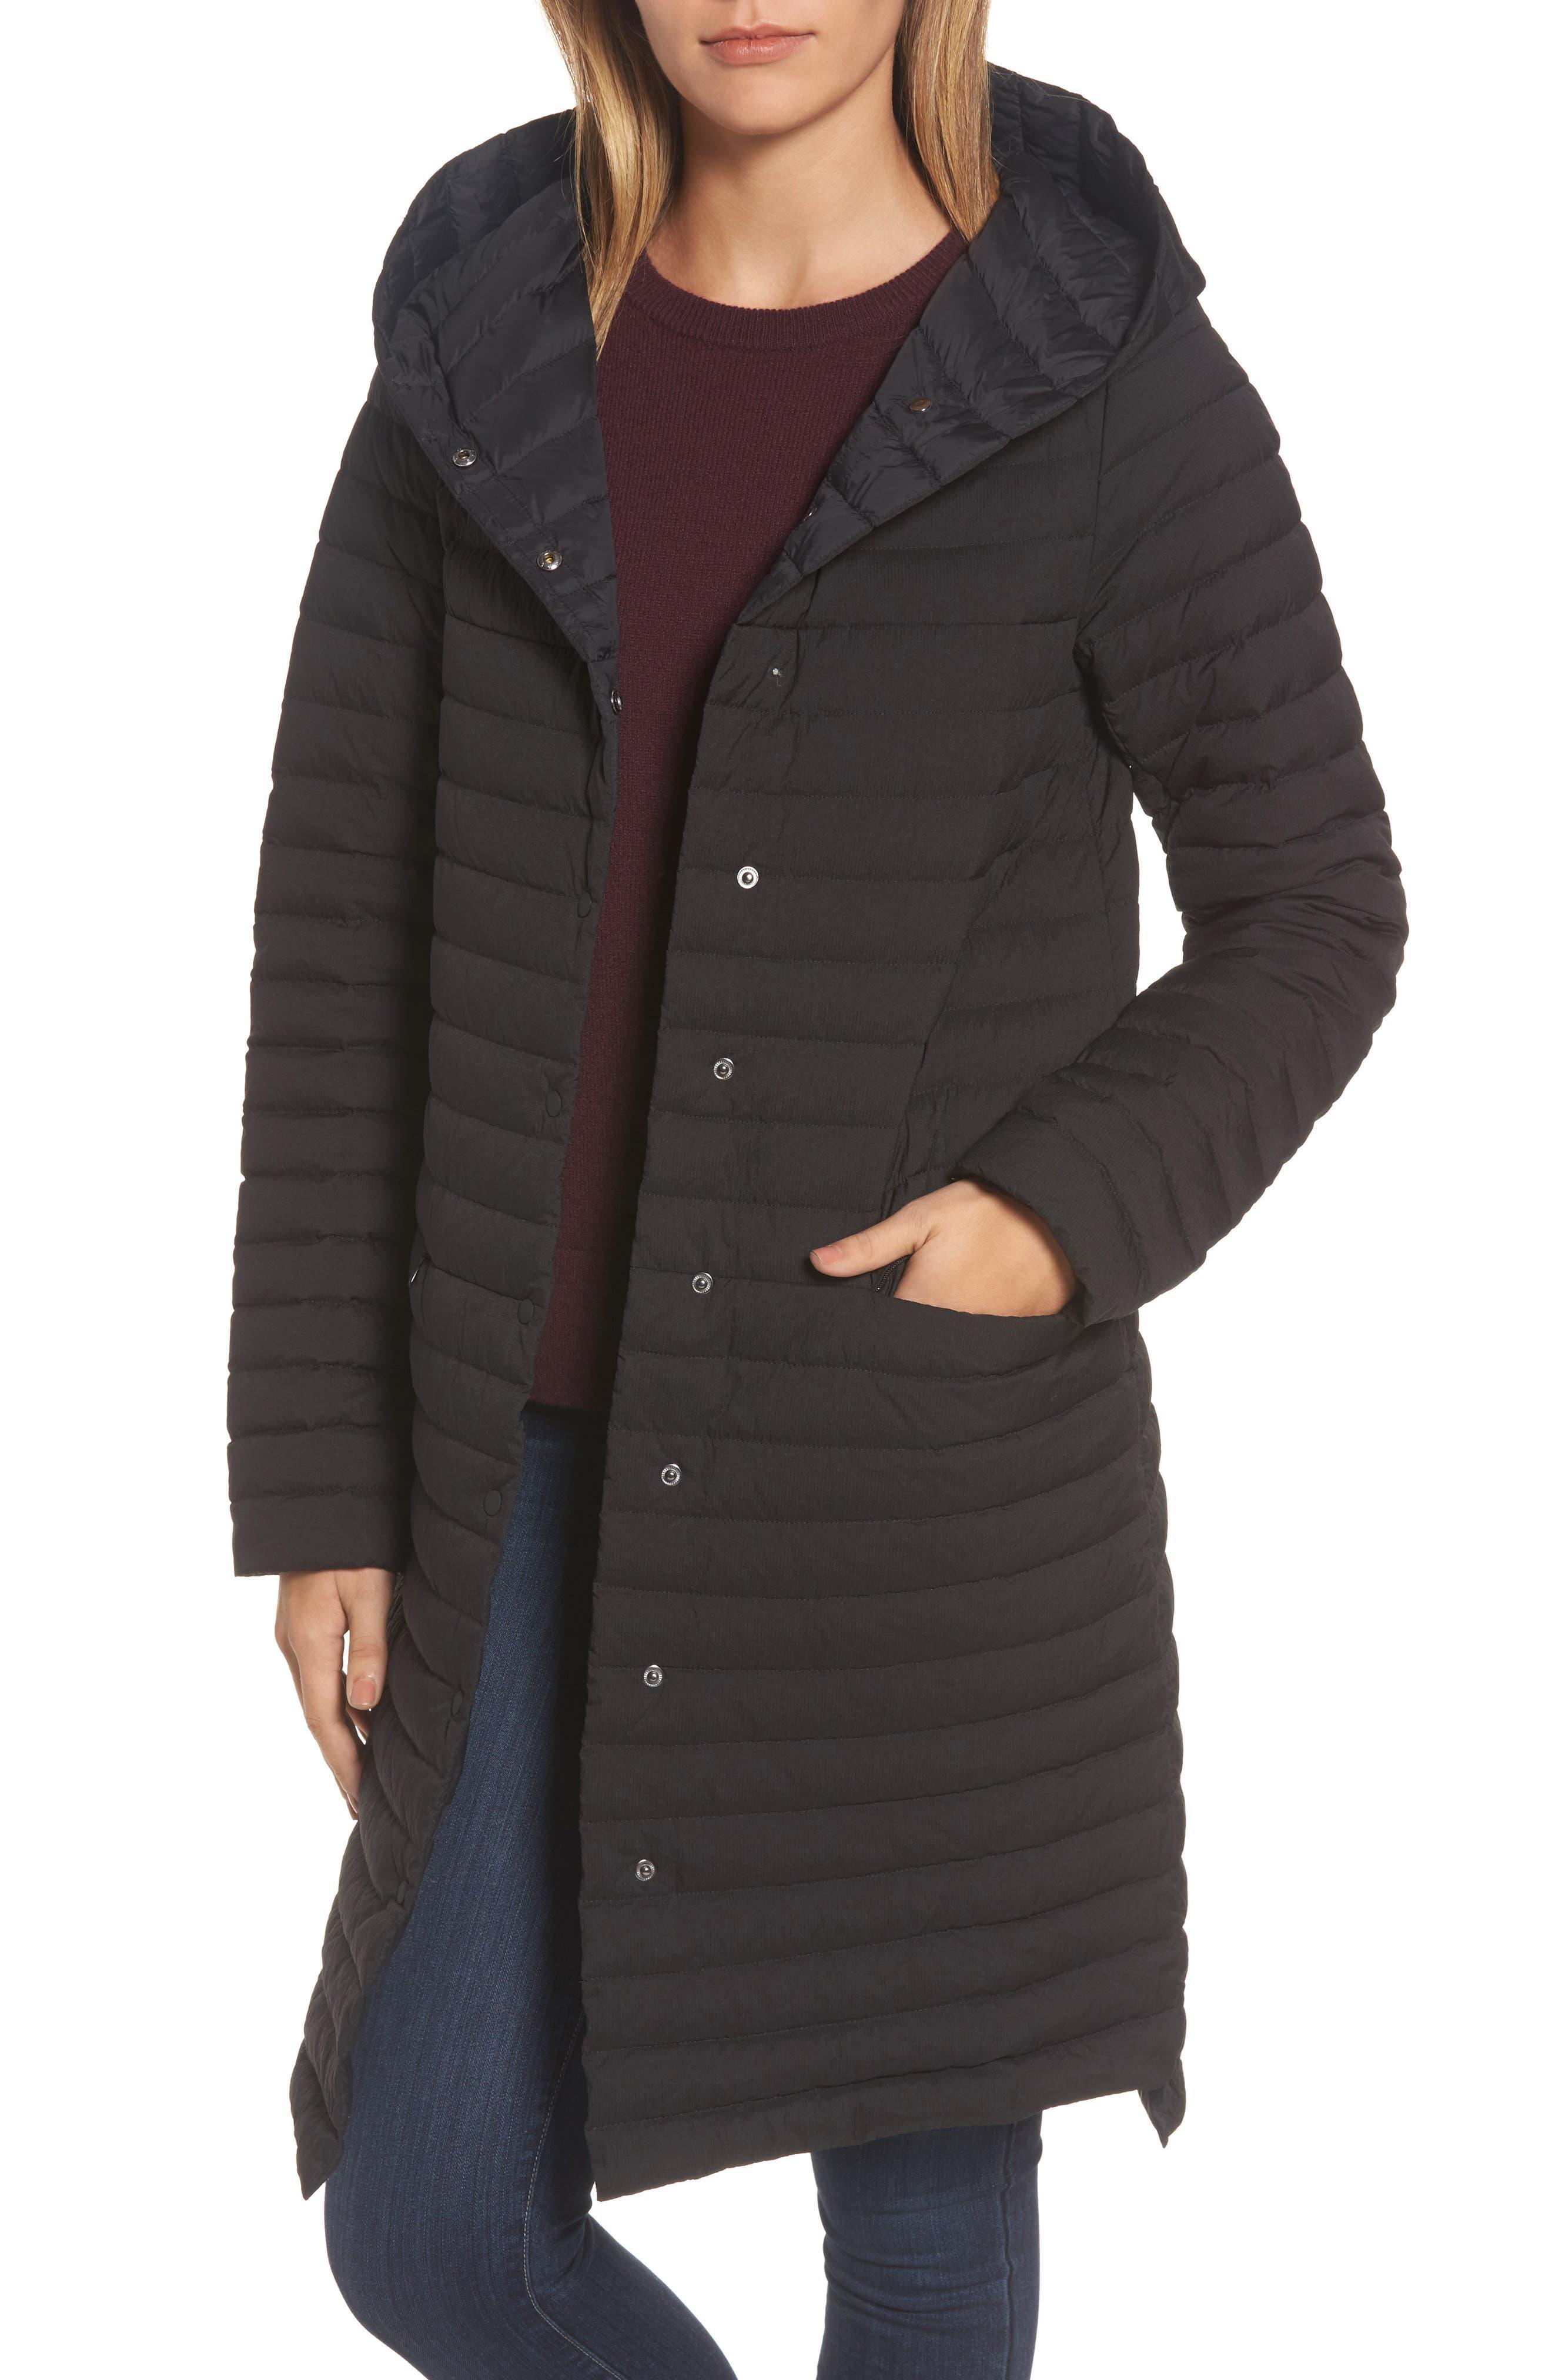 Edith Hooded Long Coat,                         Main,                         color, 001